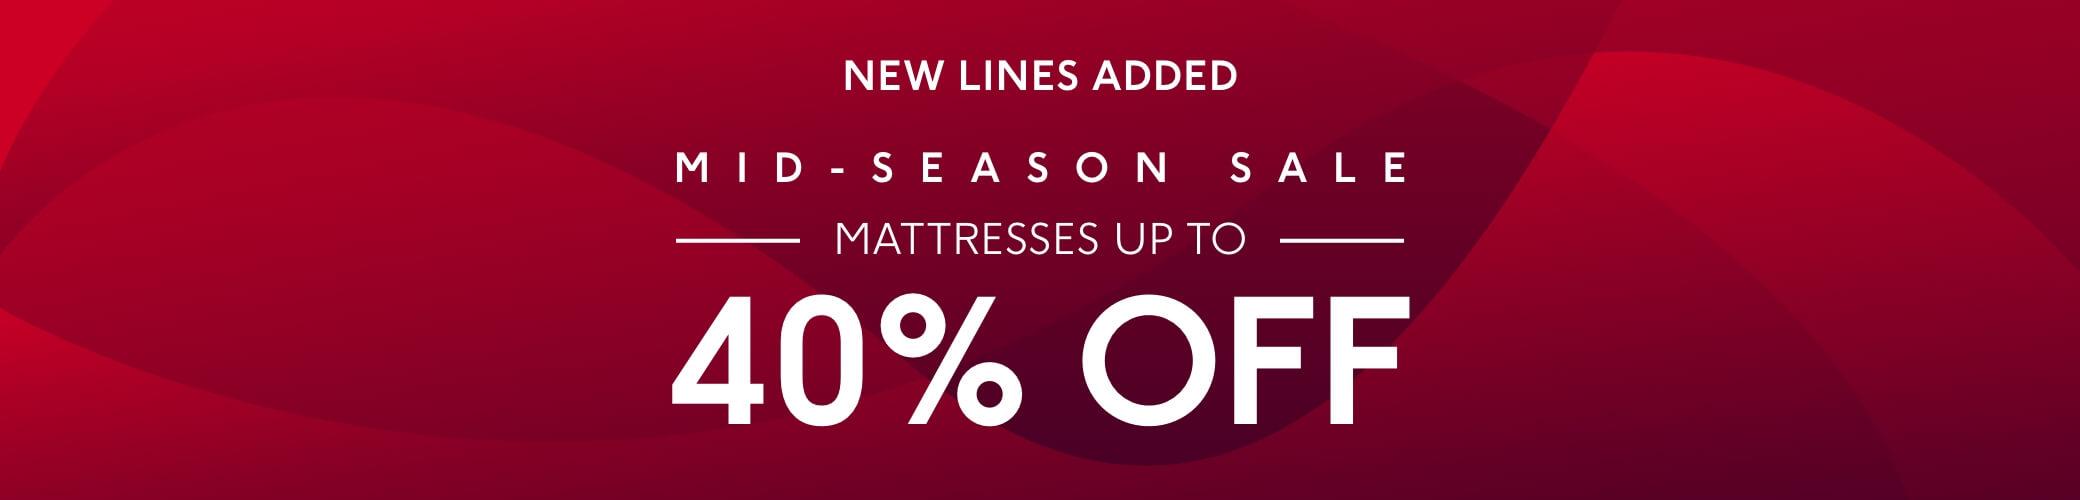 Mid-Season Sale - Up To 40% Off Mattresses